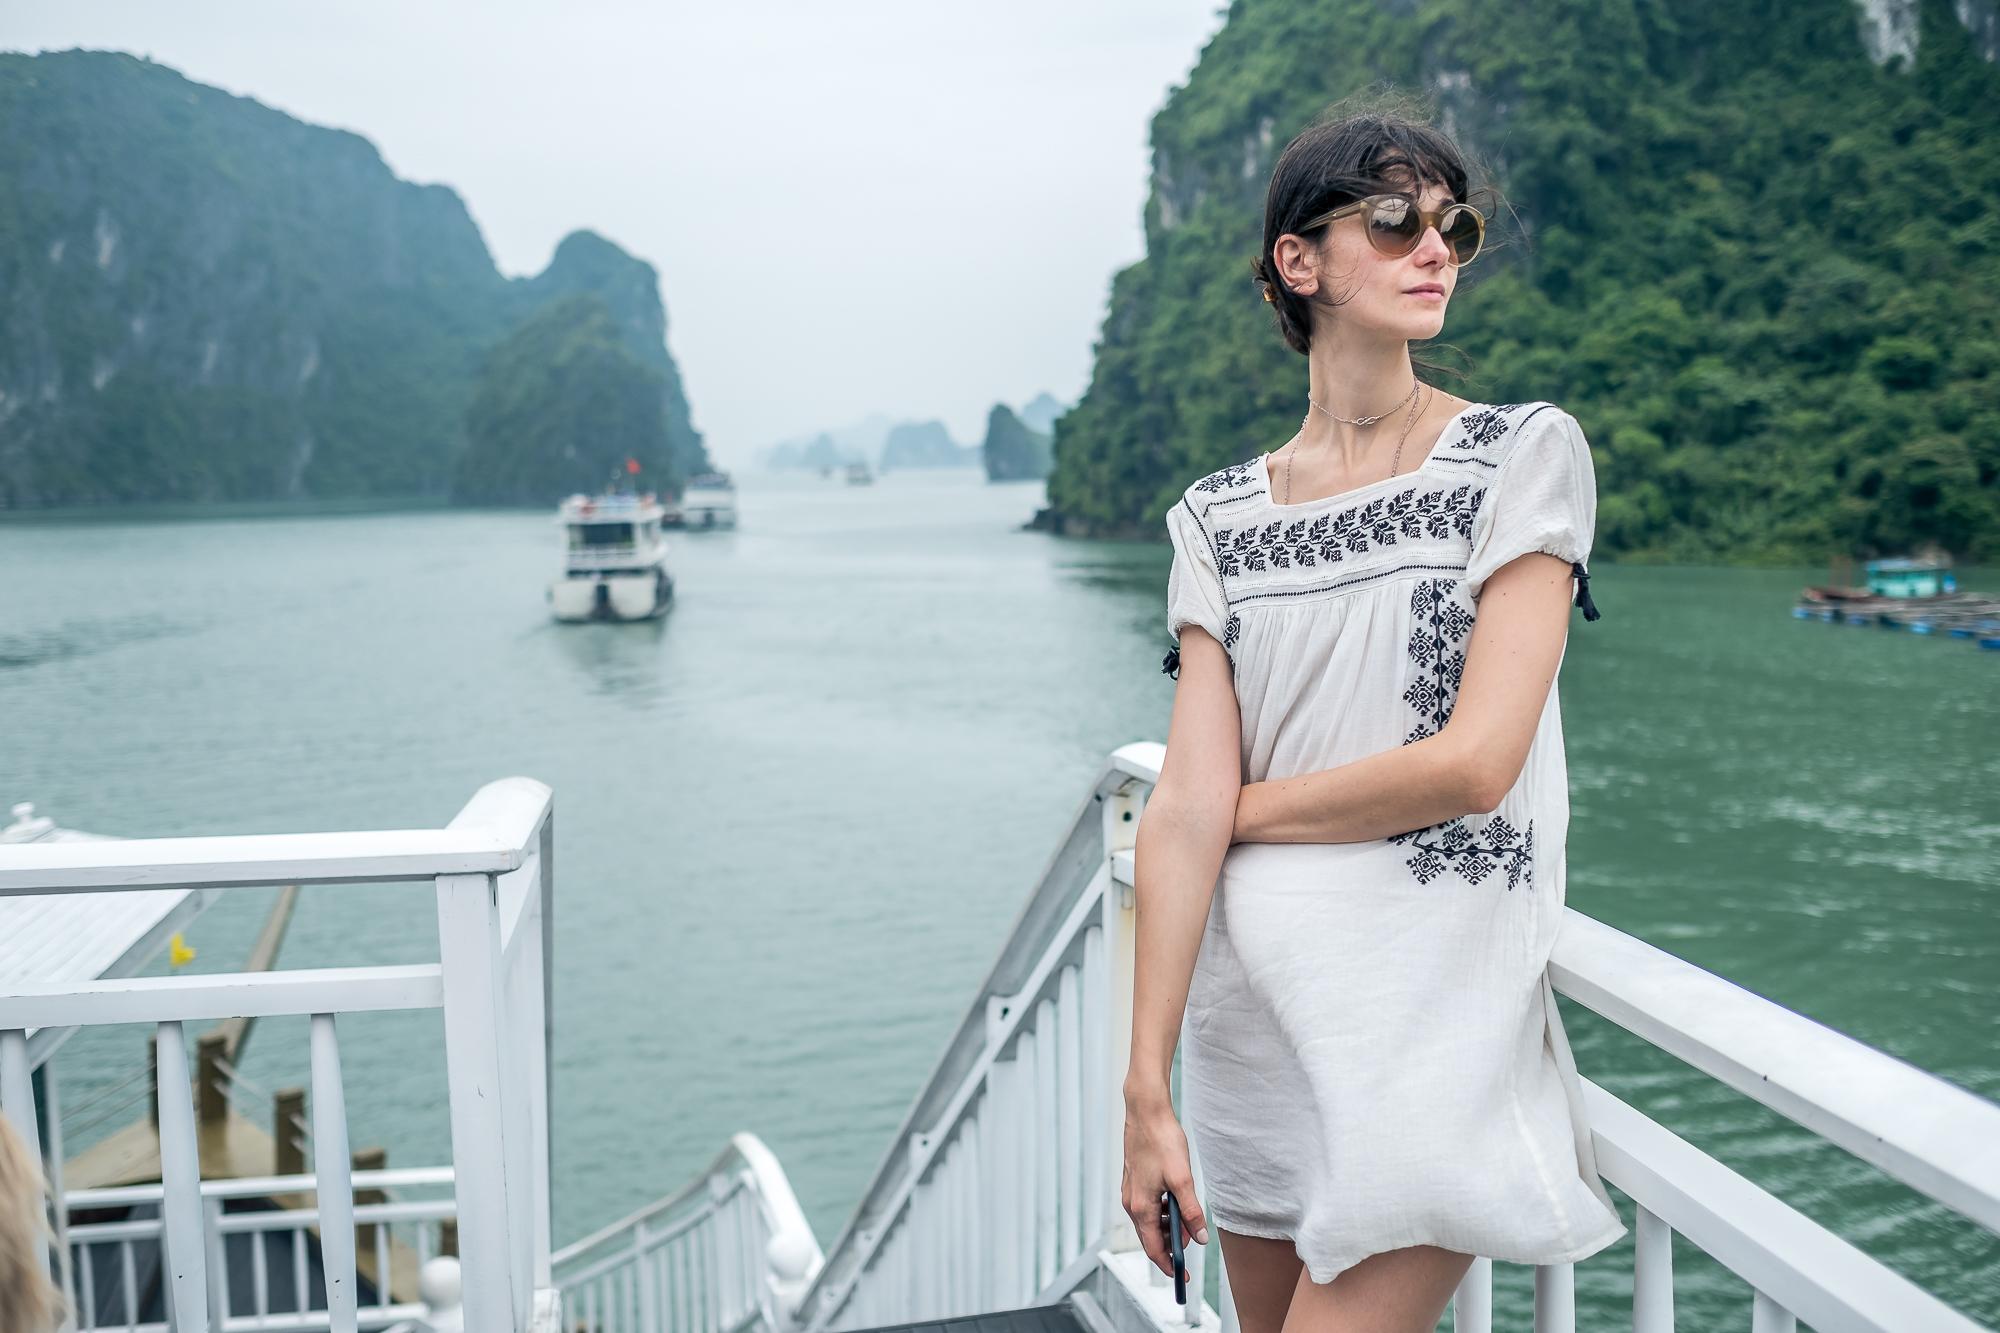 Vietnam_Honeymoon_TheOutsiderBlog_DSCF8238.JPG